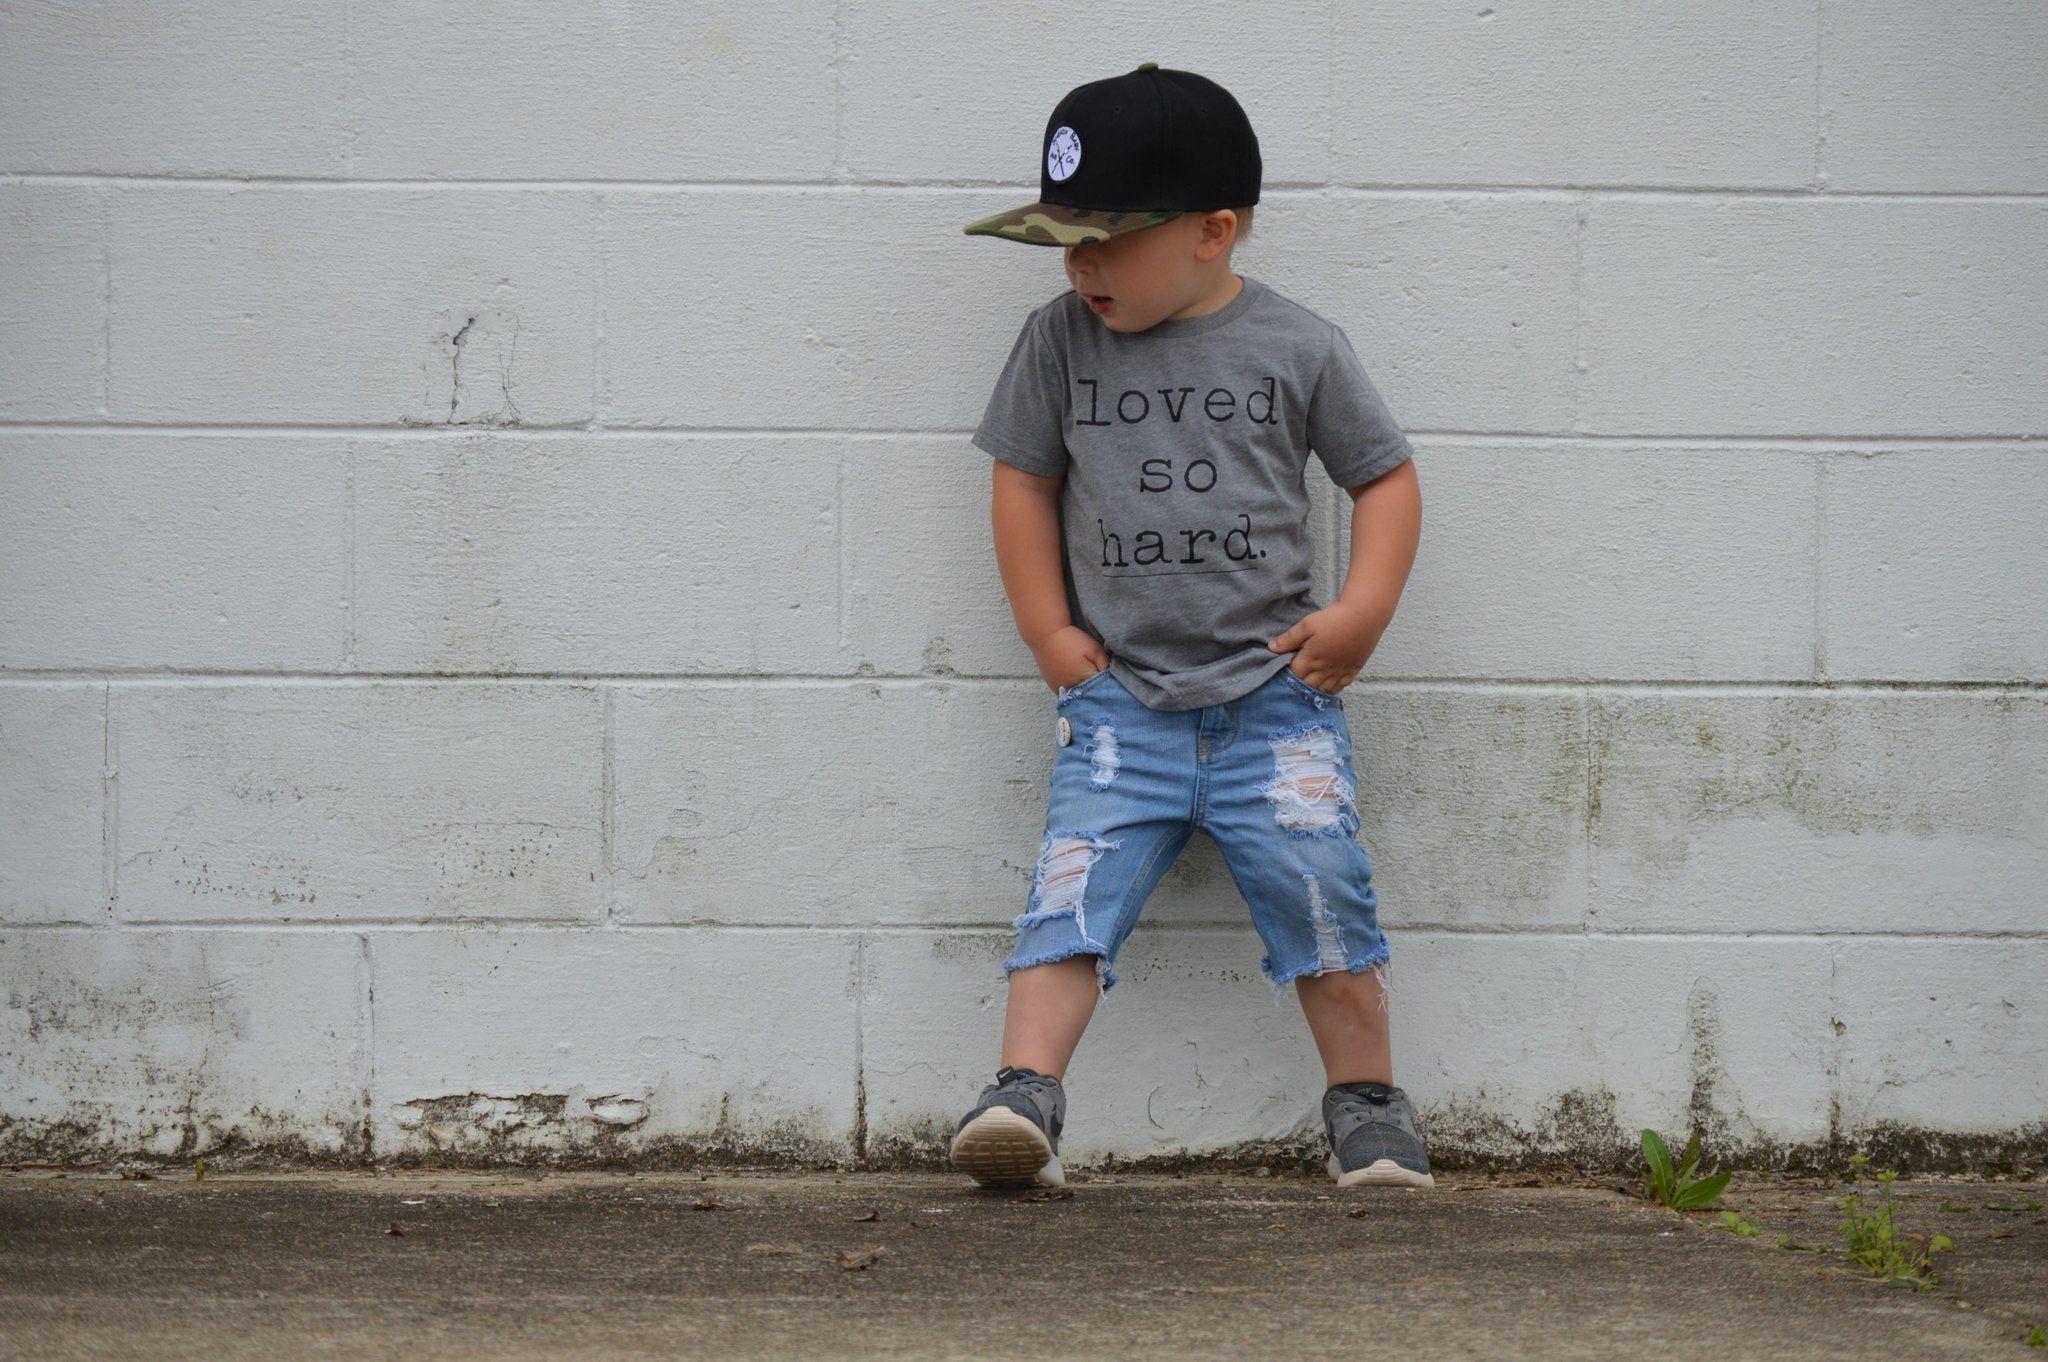 65dbf5ecc1 Farm Fresh Boardwalk Shorts, Distressed Denim Shorts for Boys- babies,  toddlers, kids; Photo Ideas, #ootd #boysootd #springfashion #spring #shorts  ...